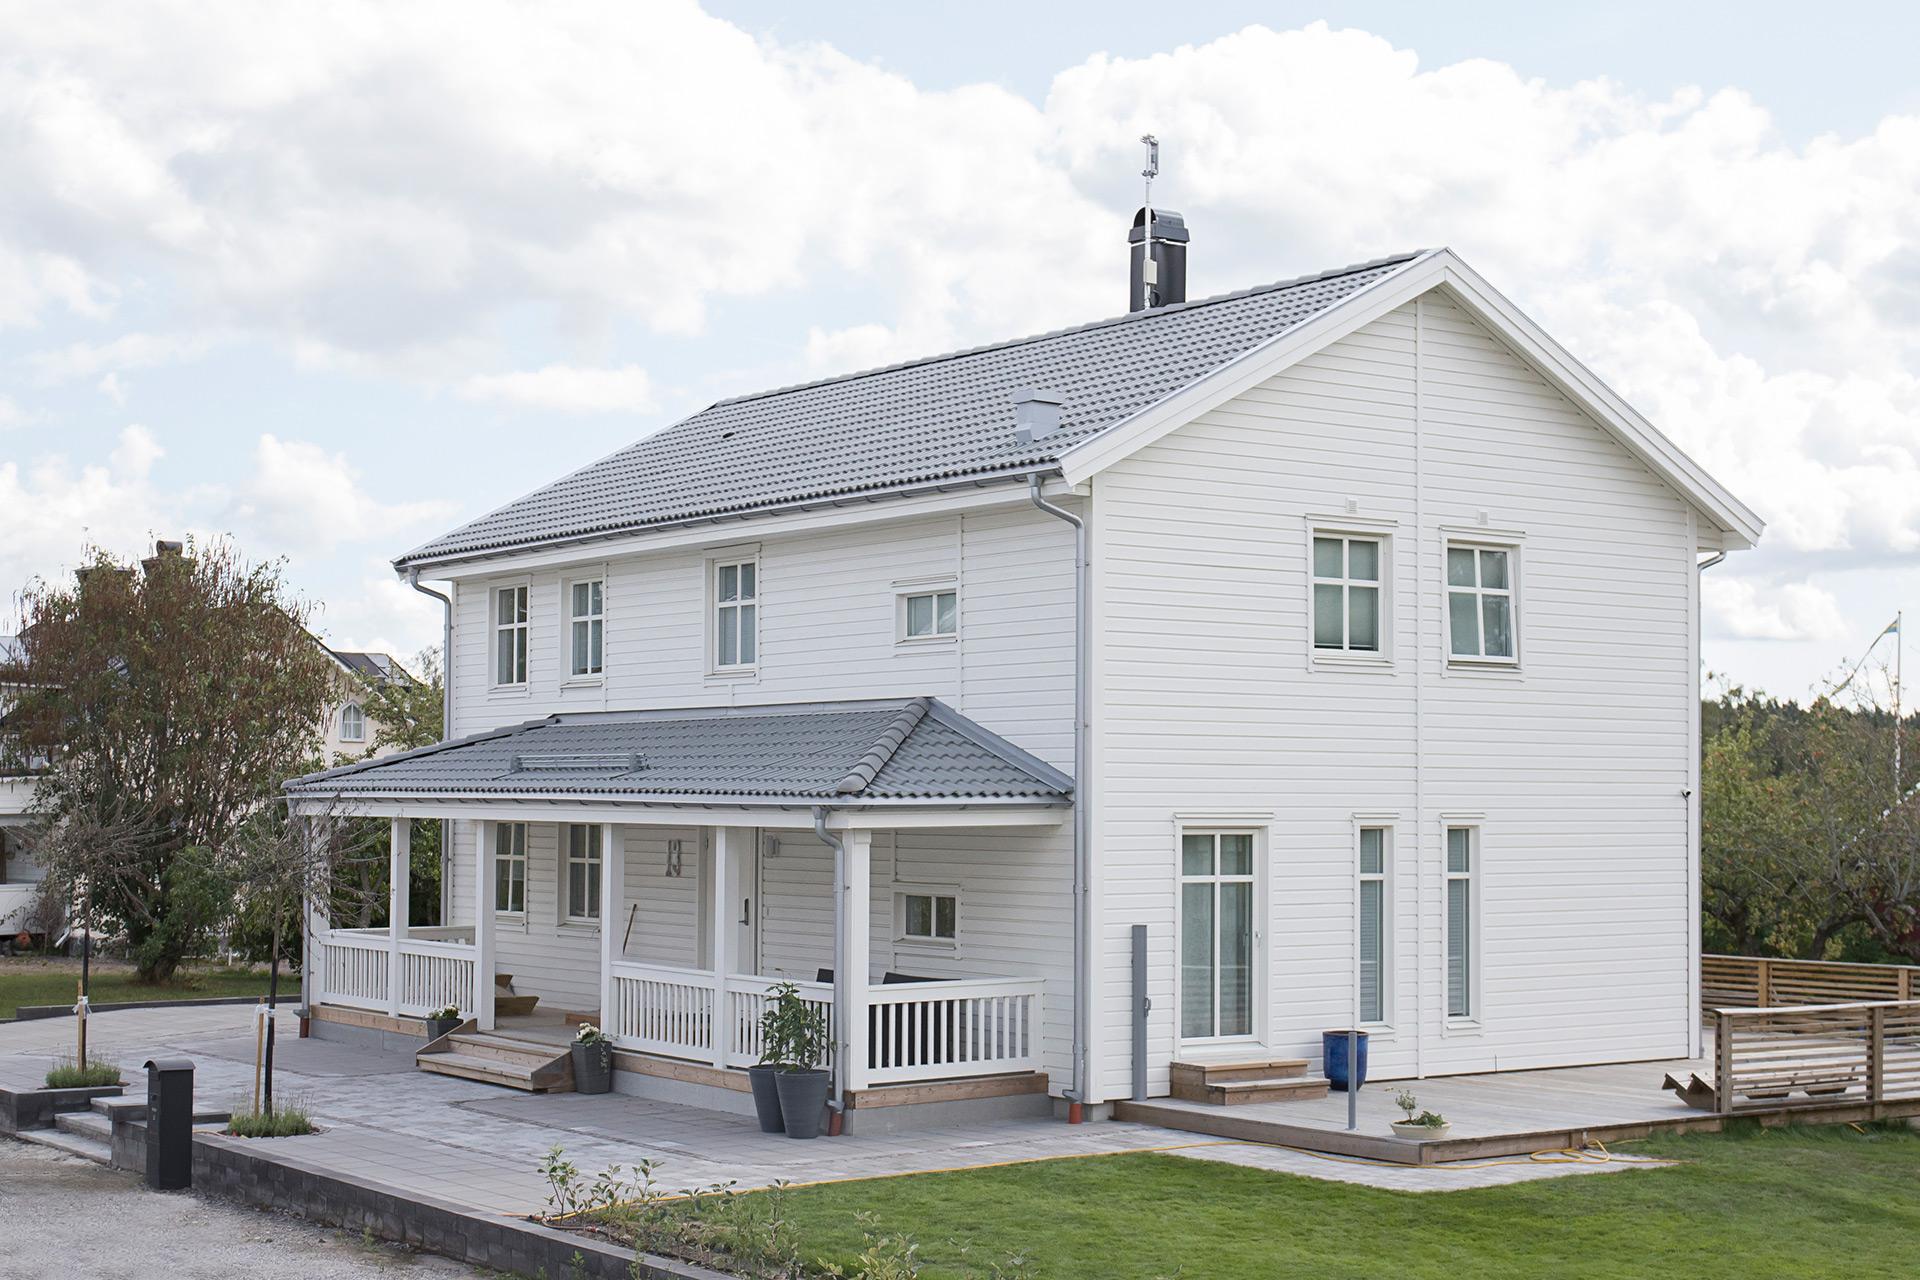 2010181-Bender-Palema-Benderit-Mellangrå-press